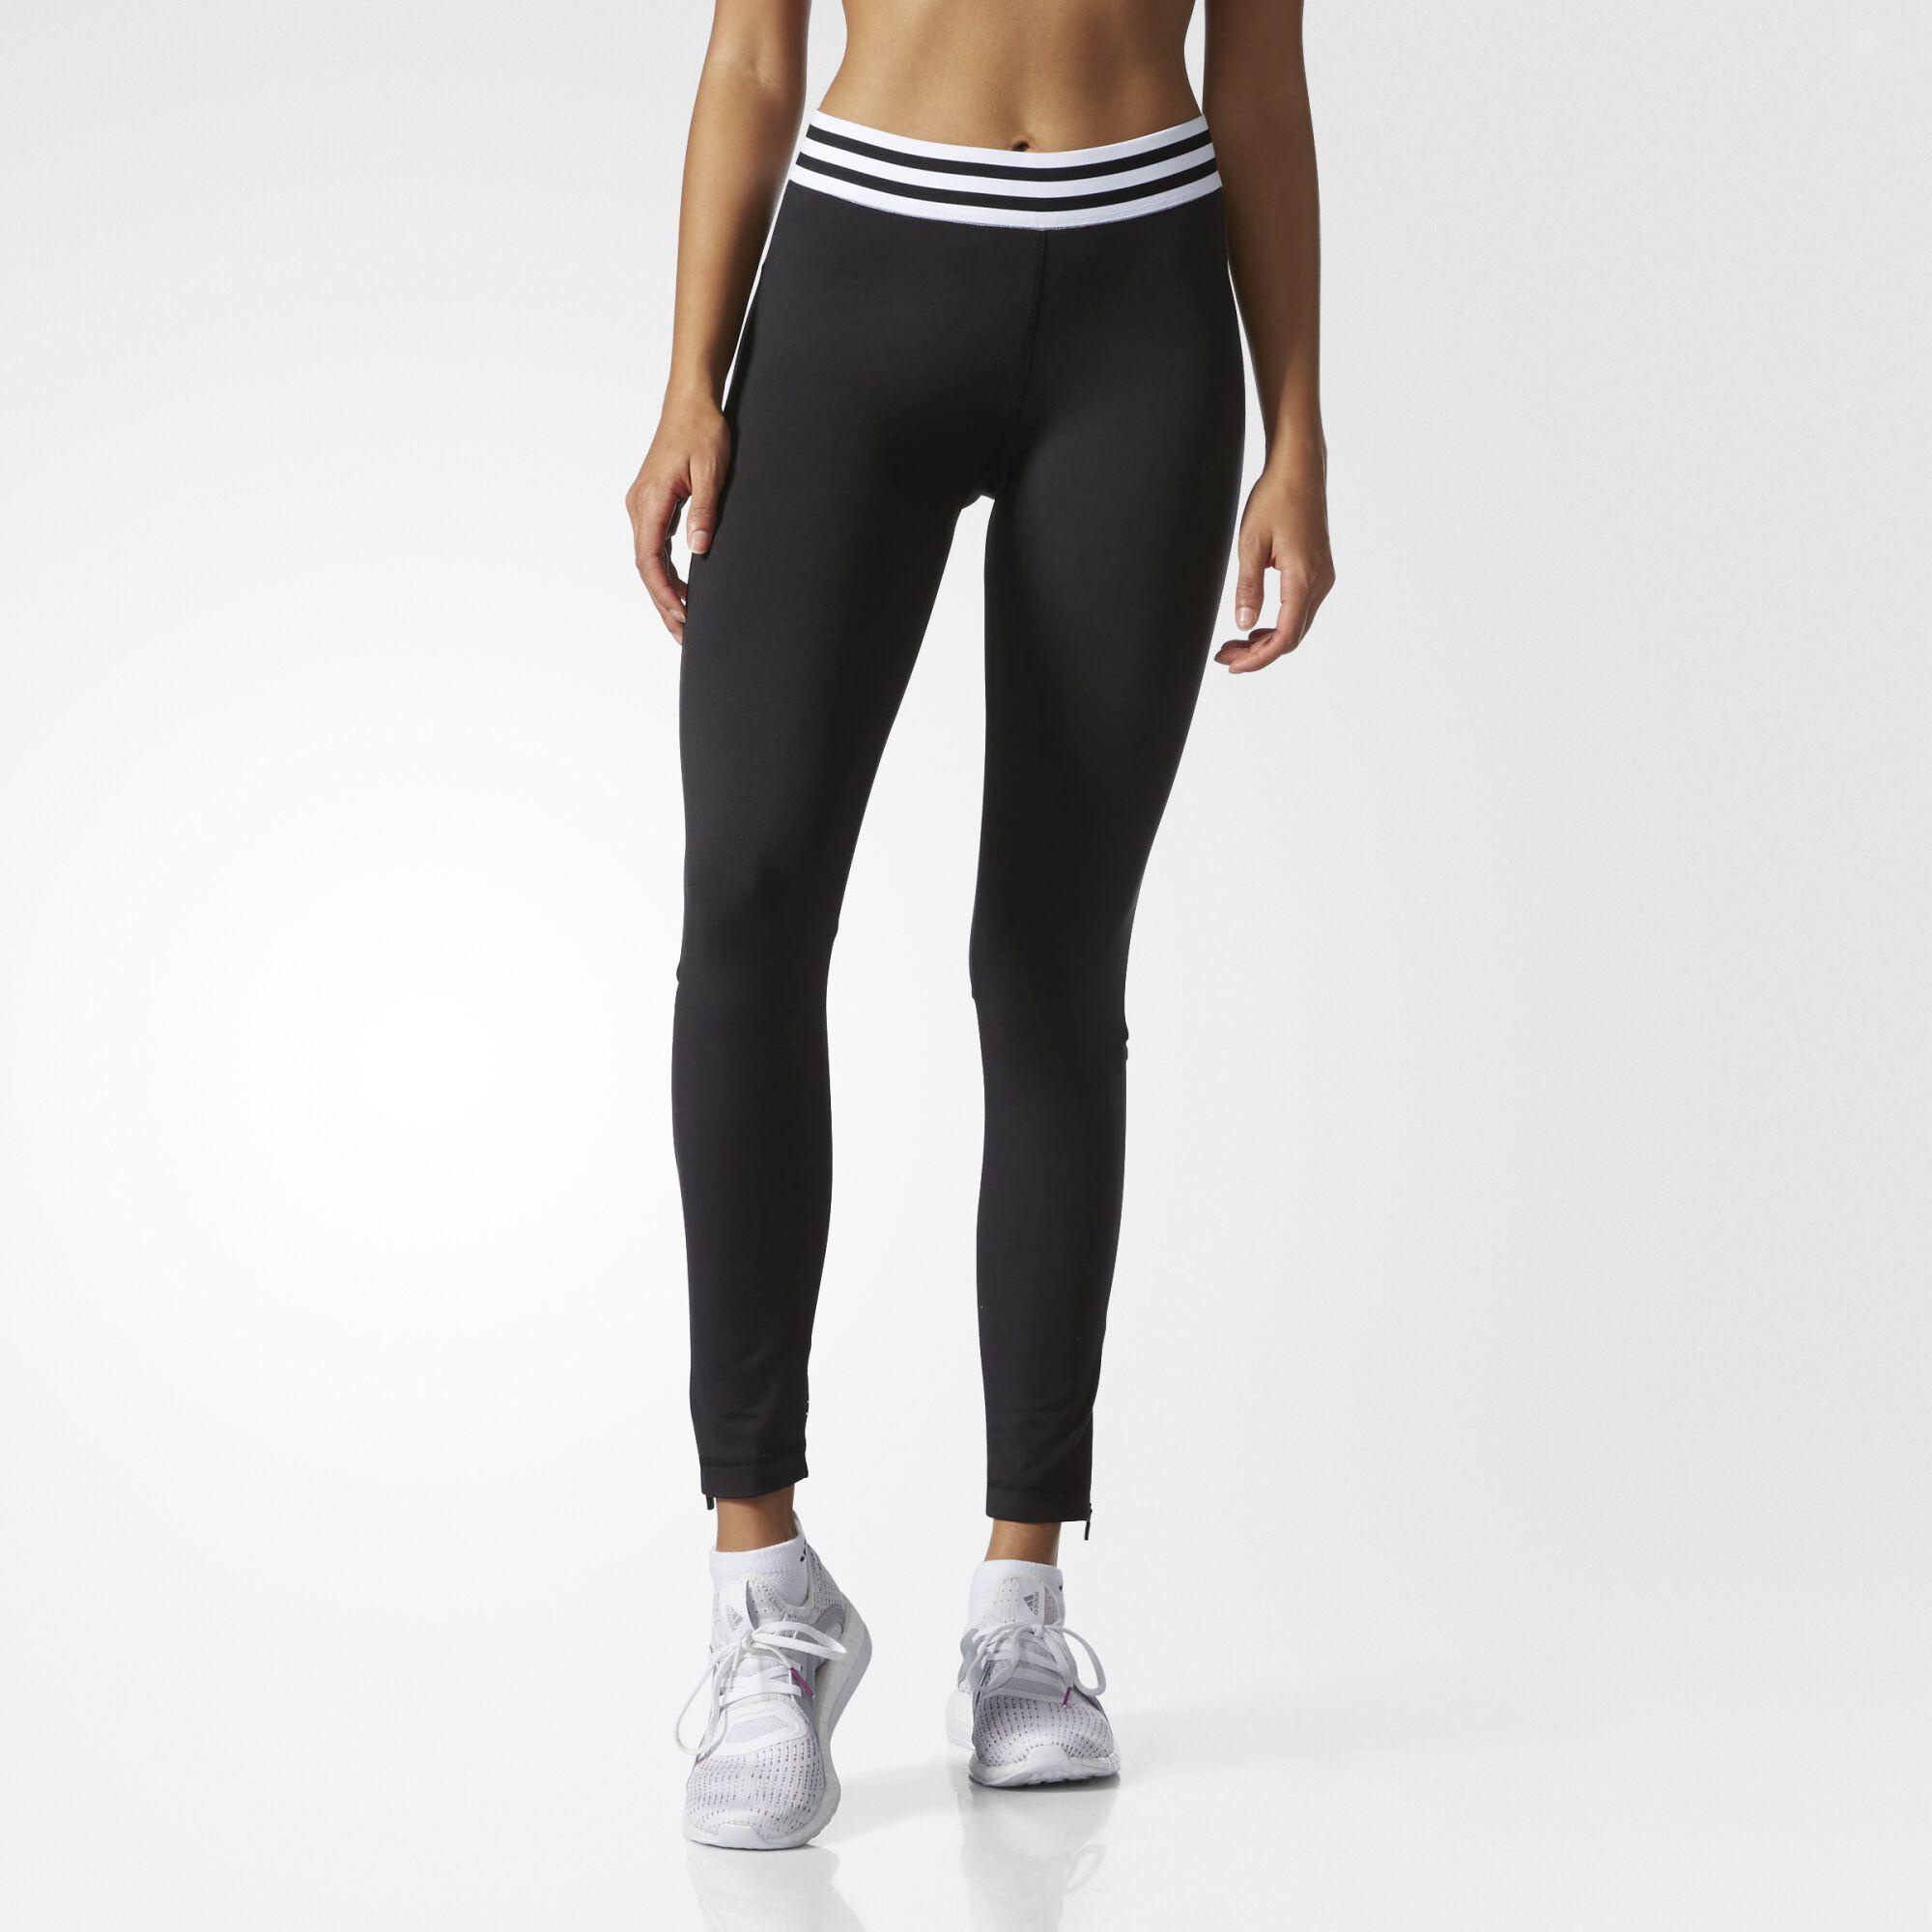 sport id leggings. Black Bedroom Furniture Sets. Home Design Ideas